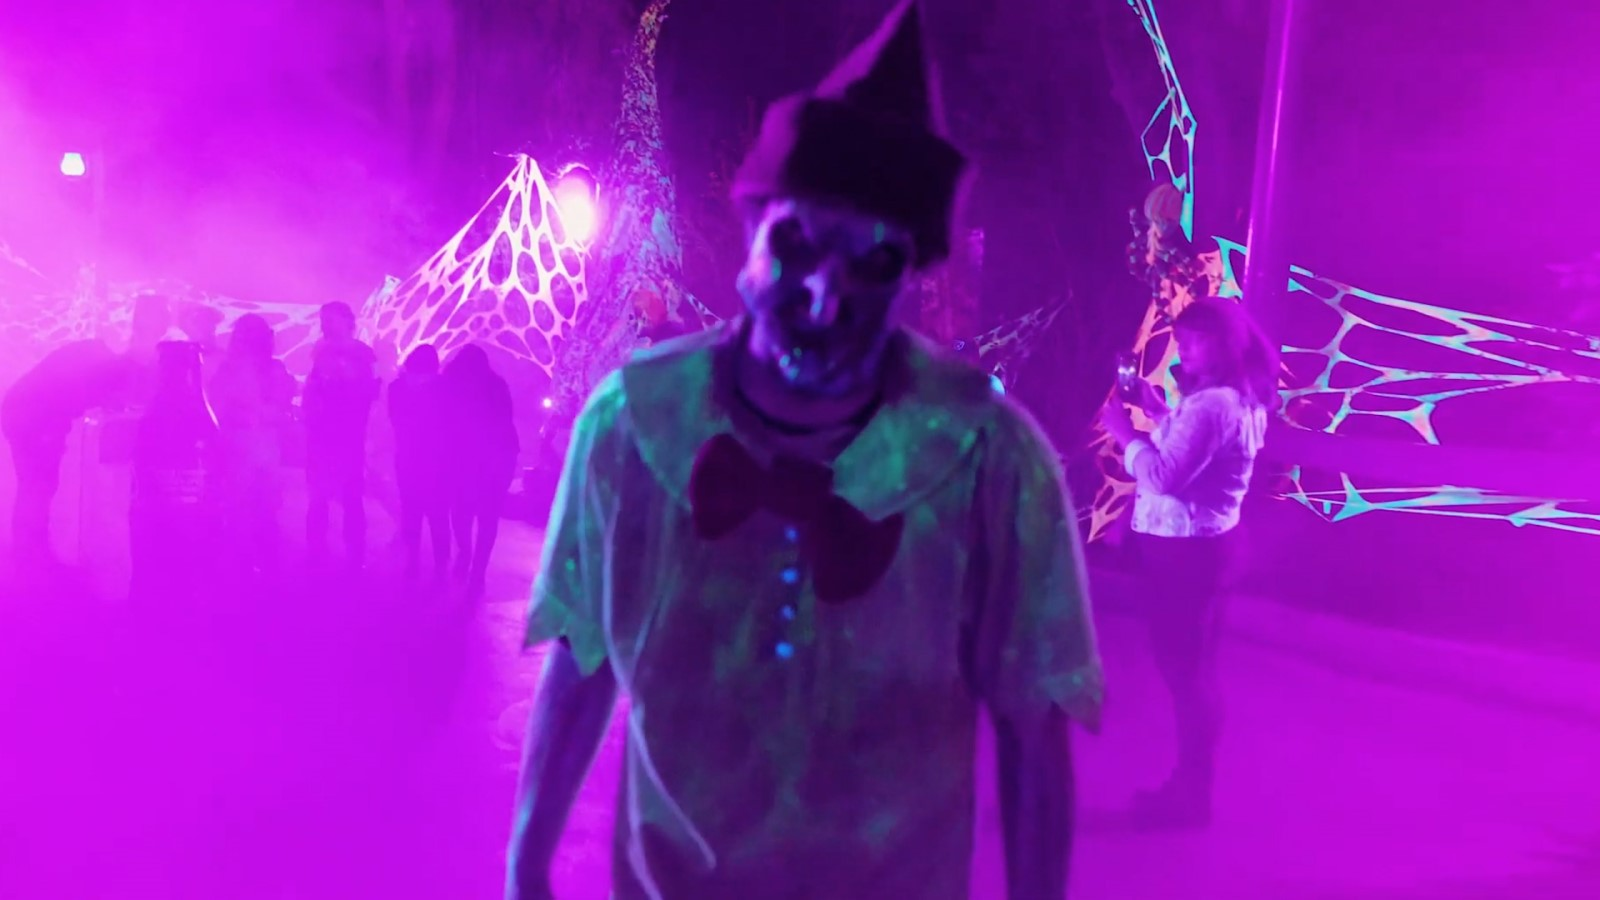 Six Flags Magic Mountain - Fright Fest, 2019, AV, Los Angeles, CA